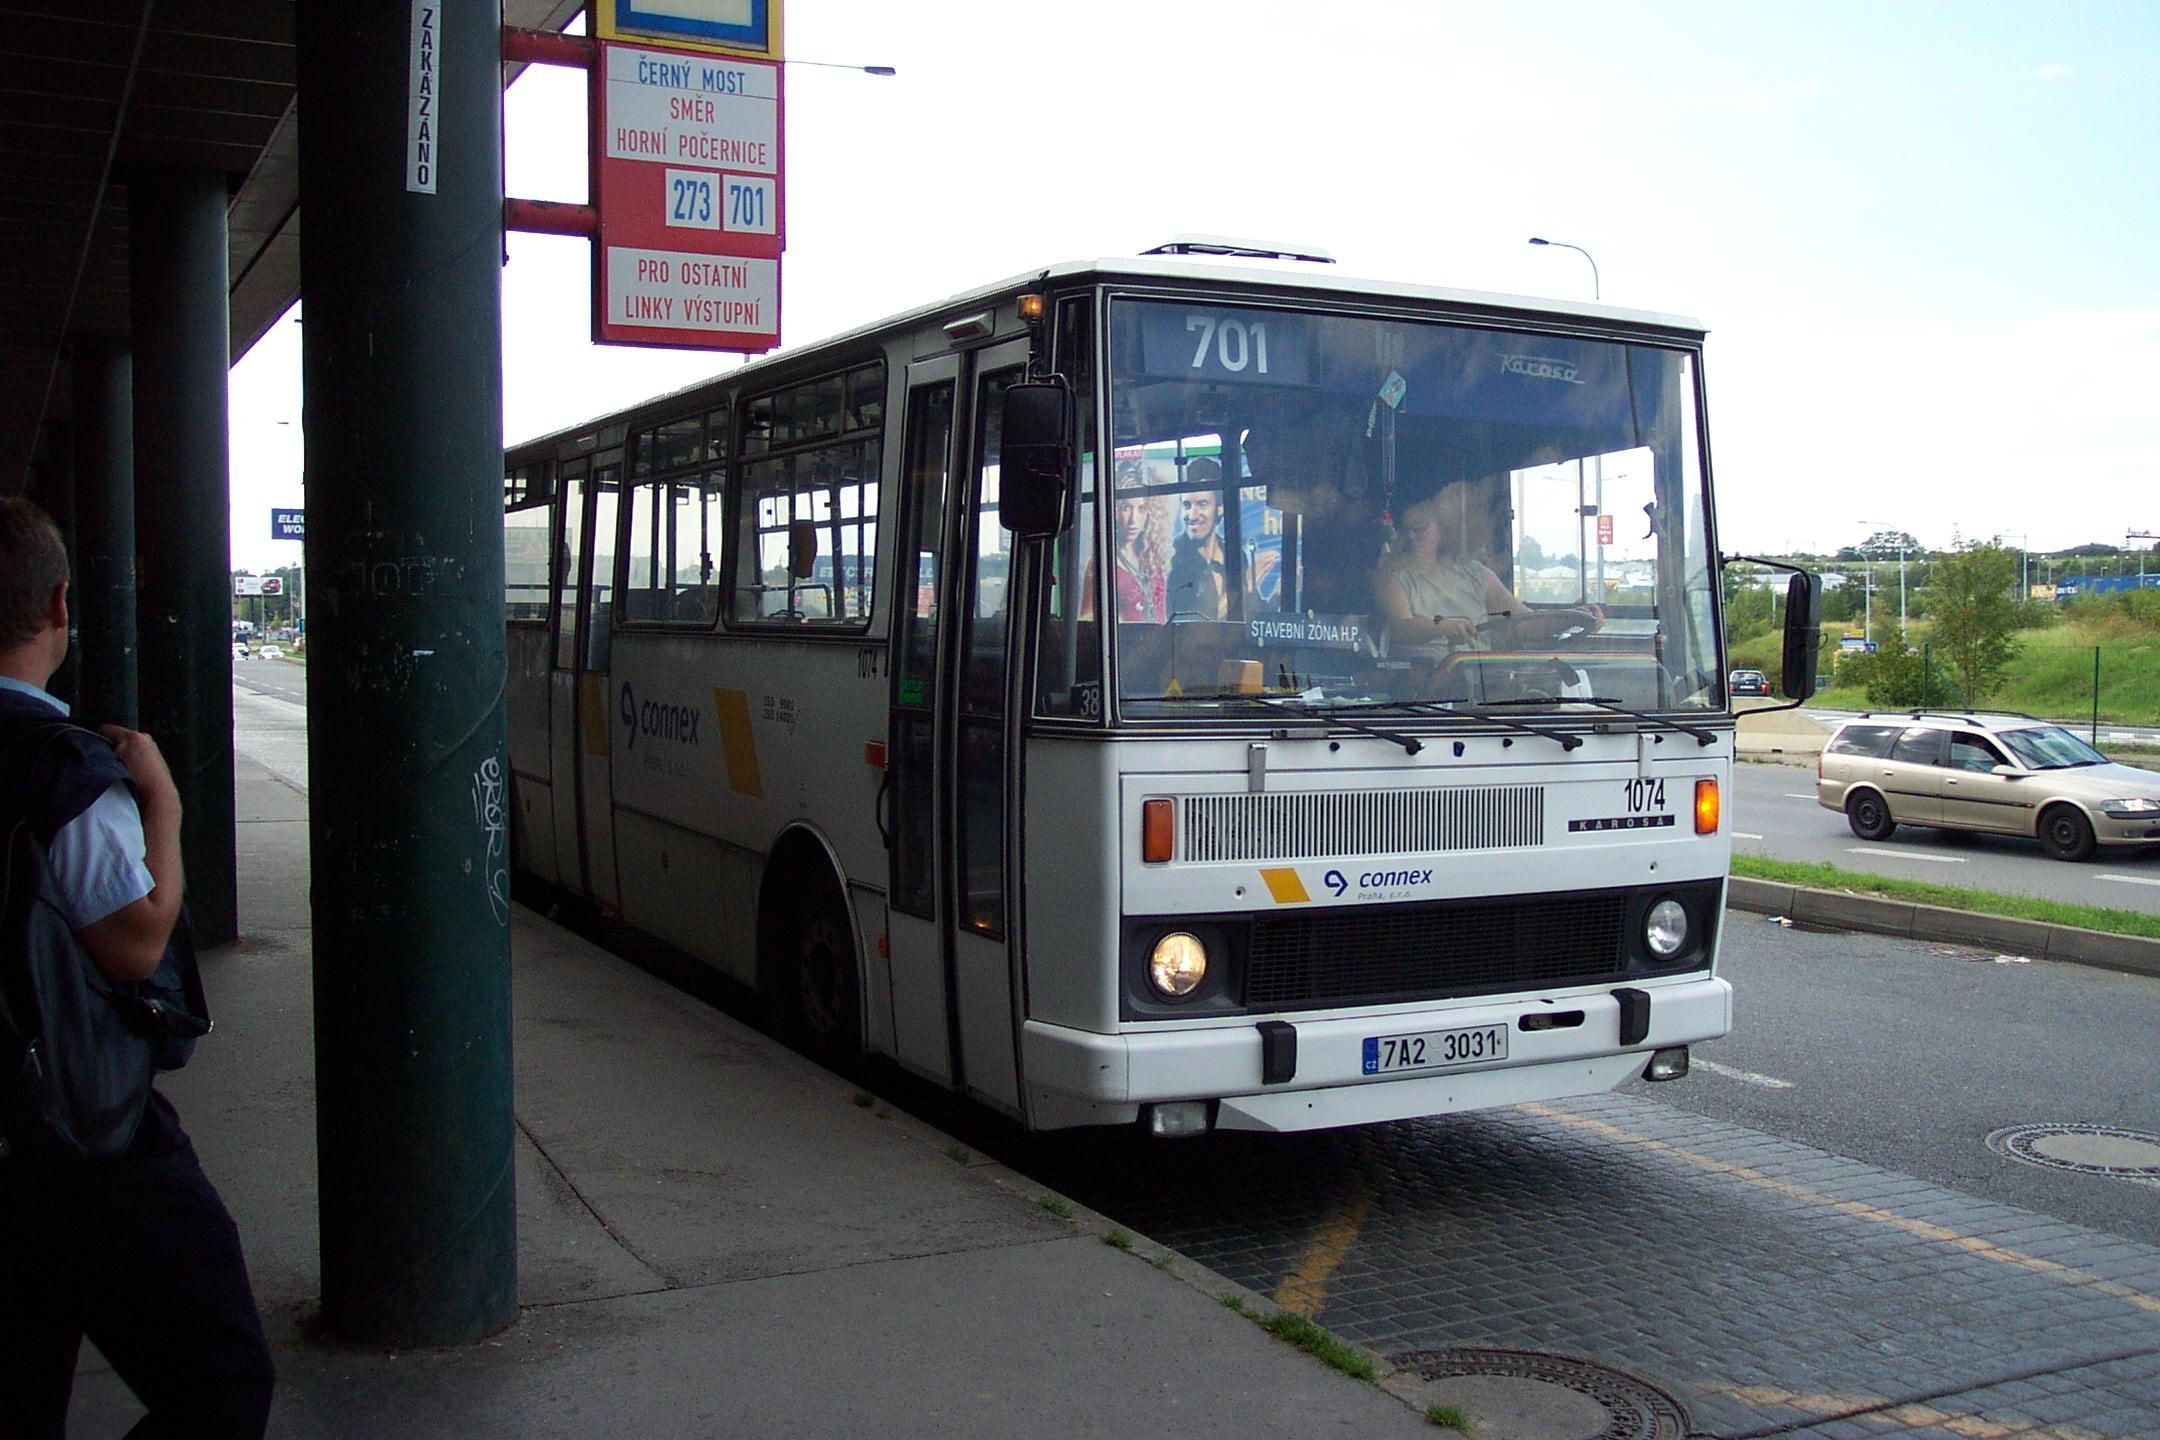 file:praha, Černý most, bus 701 connex - wikimedia commons